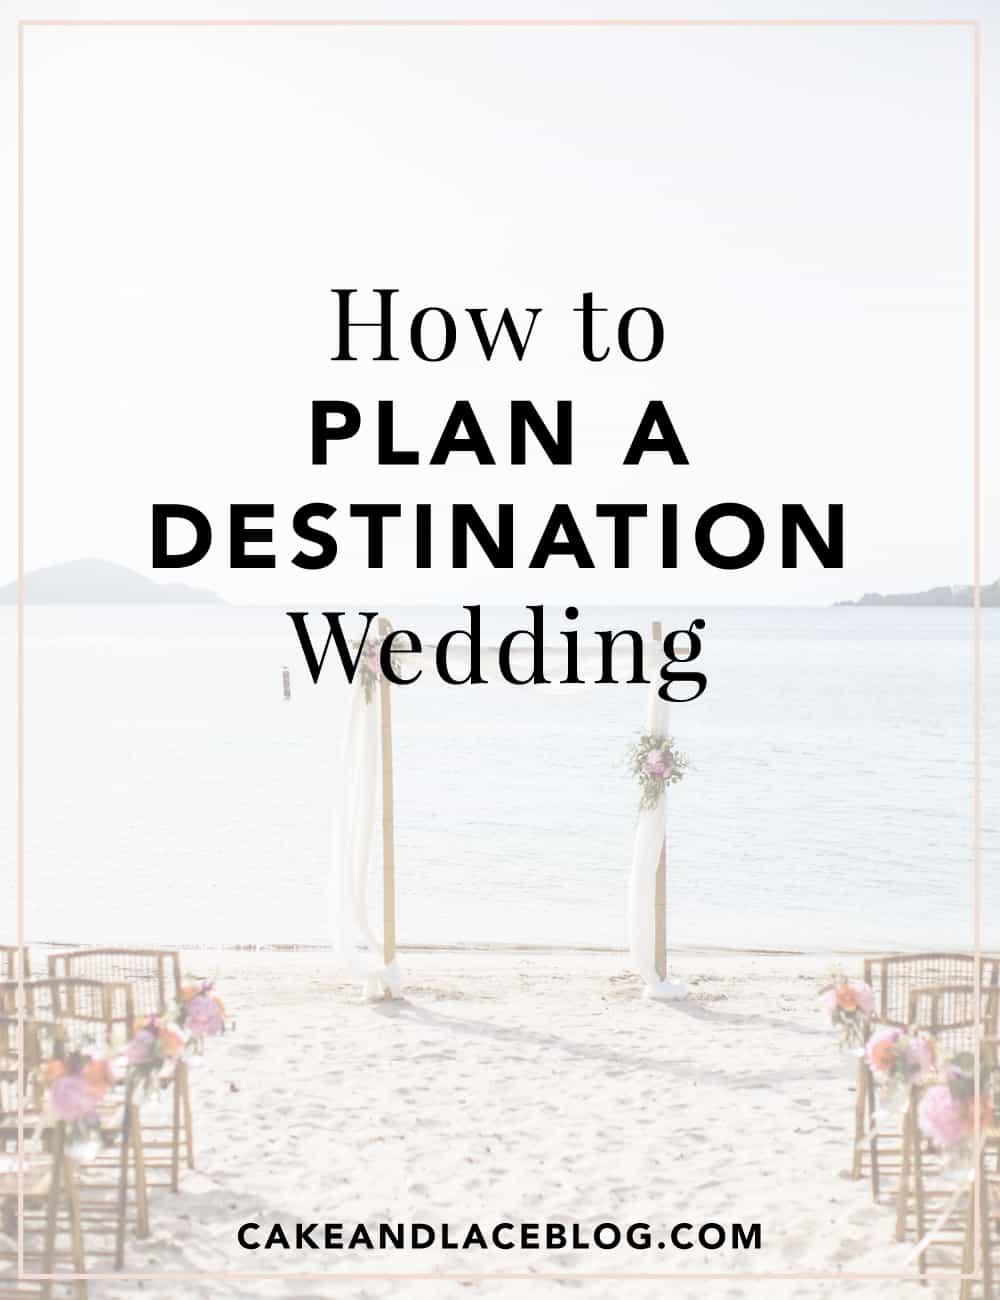 How-to-Plan-a-Destination-Wedding